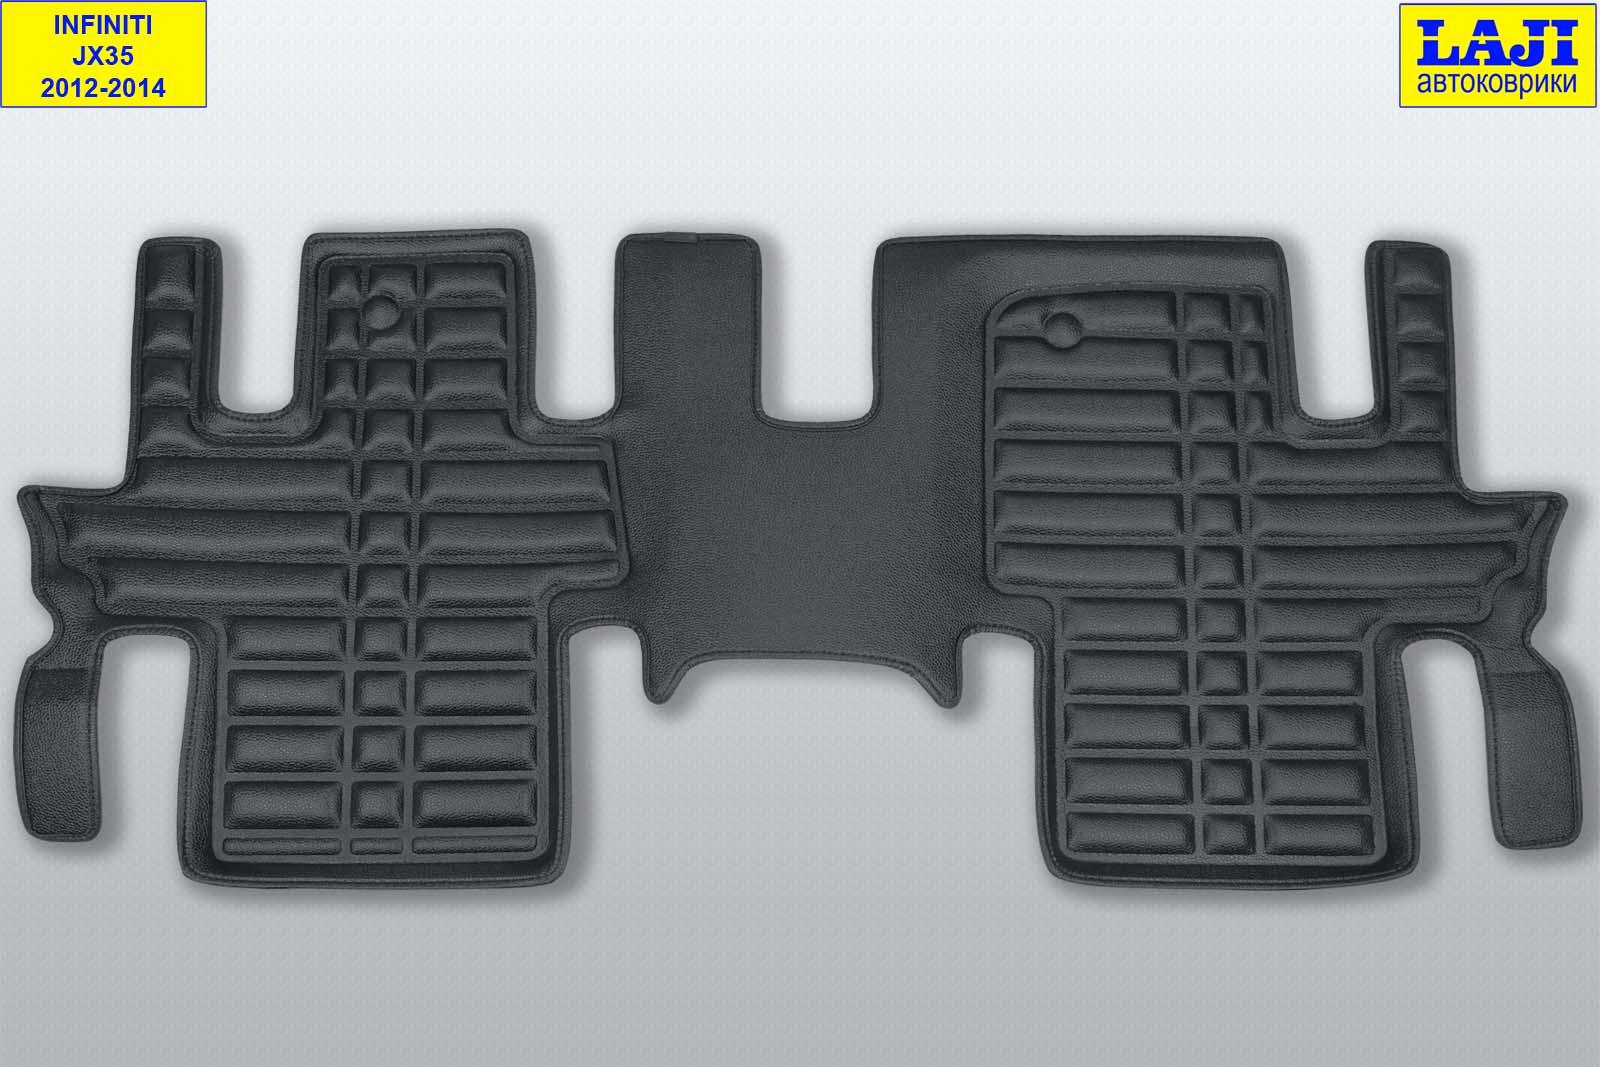 5D коврики в салон Infiniti JX35 2012-2014 9